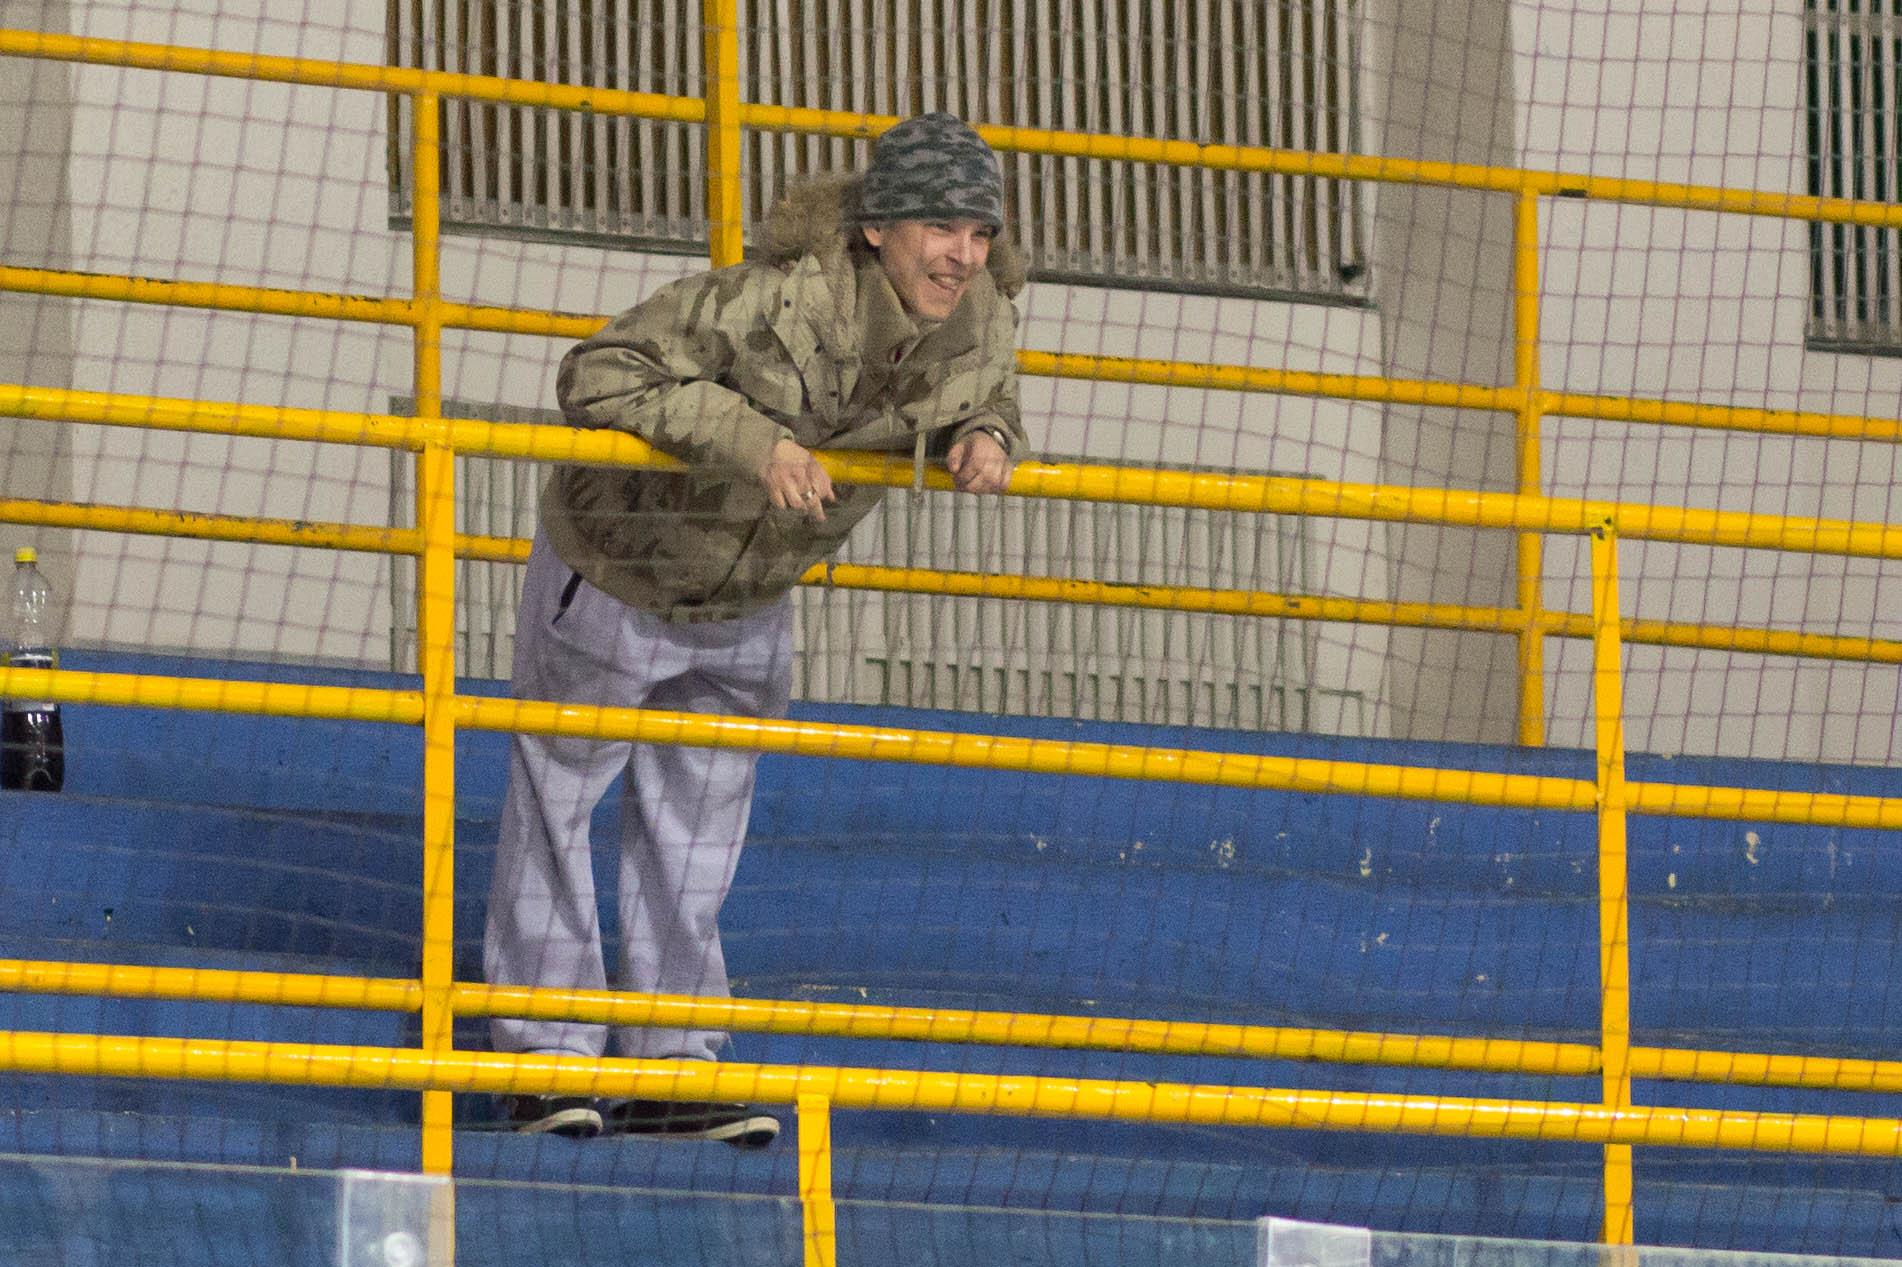 zhkm-zvolen-hc-spisska-n-ves-2013-hokej-26